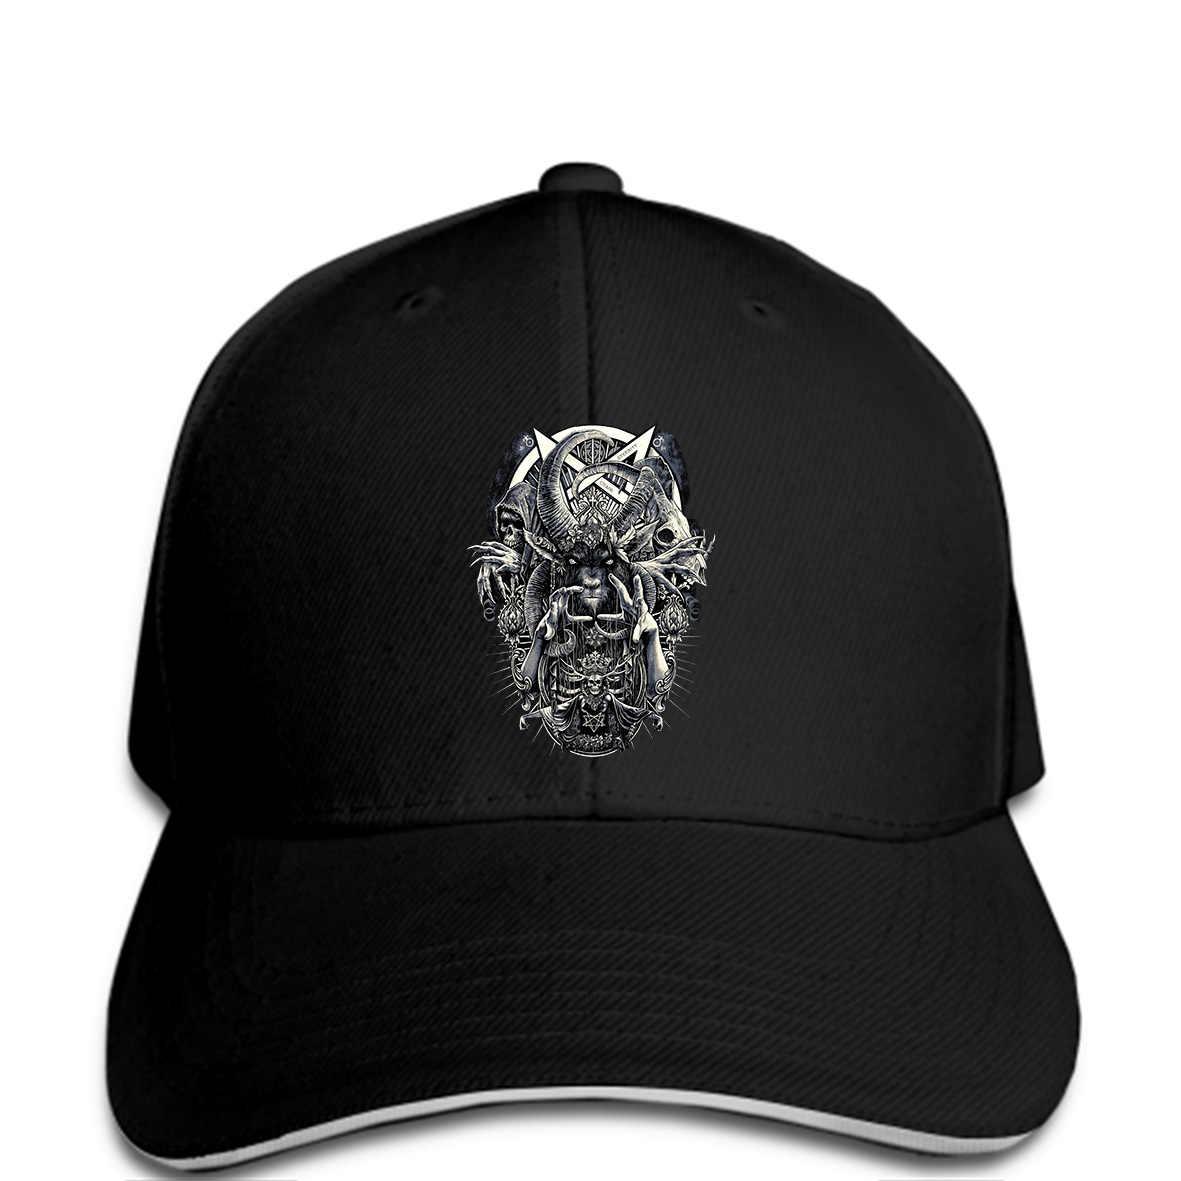 9feab8e0036b39 Men Baseball cap Cult Genuine Darkside Occult Nu Goth Satanic Gothic  Alternative Summber Black Tope For